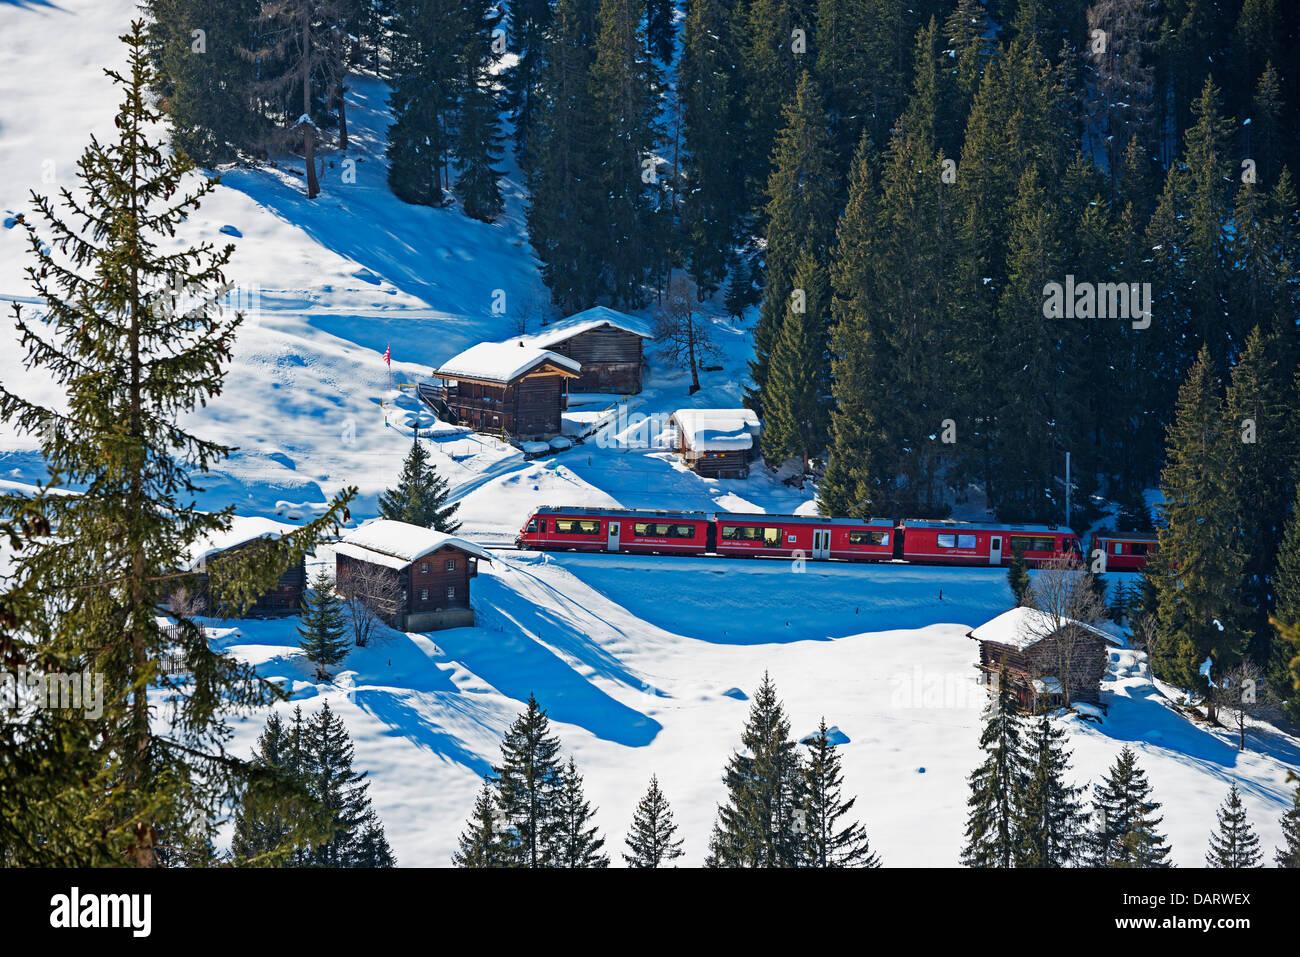 Europe, Switzerland, Graubunden, Arosa mountain resort, narrow gauge railway - Stock Image